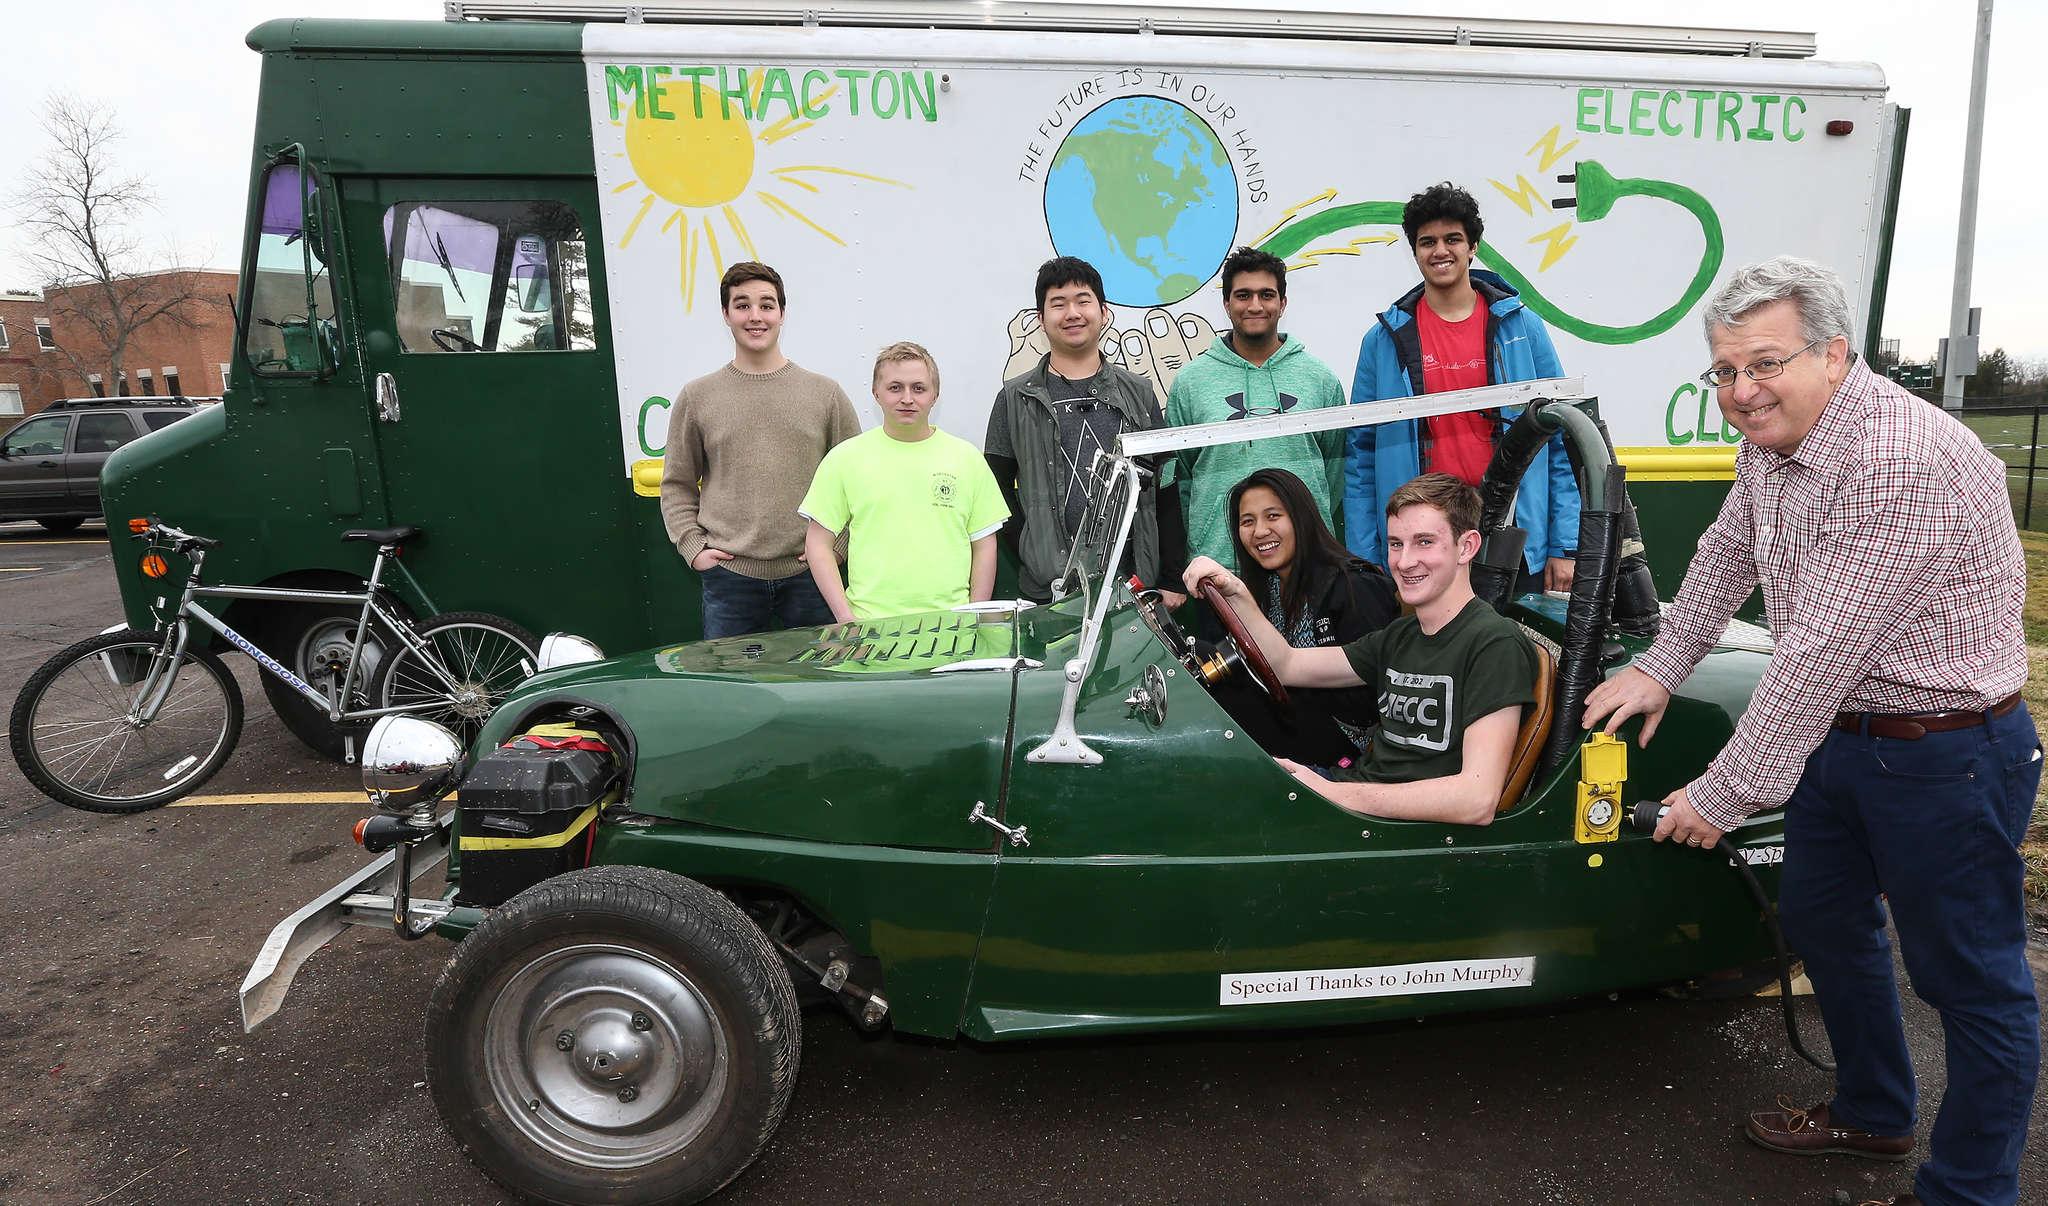 Sponsor Steve Savitz shows off the Lomax, with (in car) Amanda Amornwichet, Bryce Merrill, (from left) Jerrod Carney, Christian McIlhenny, Spencer Park, Satvik Kakkar, and Anuraag Nadkarni, at Methacton High School.